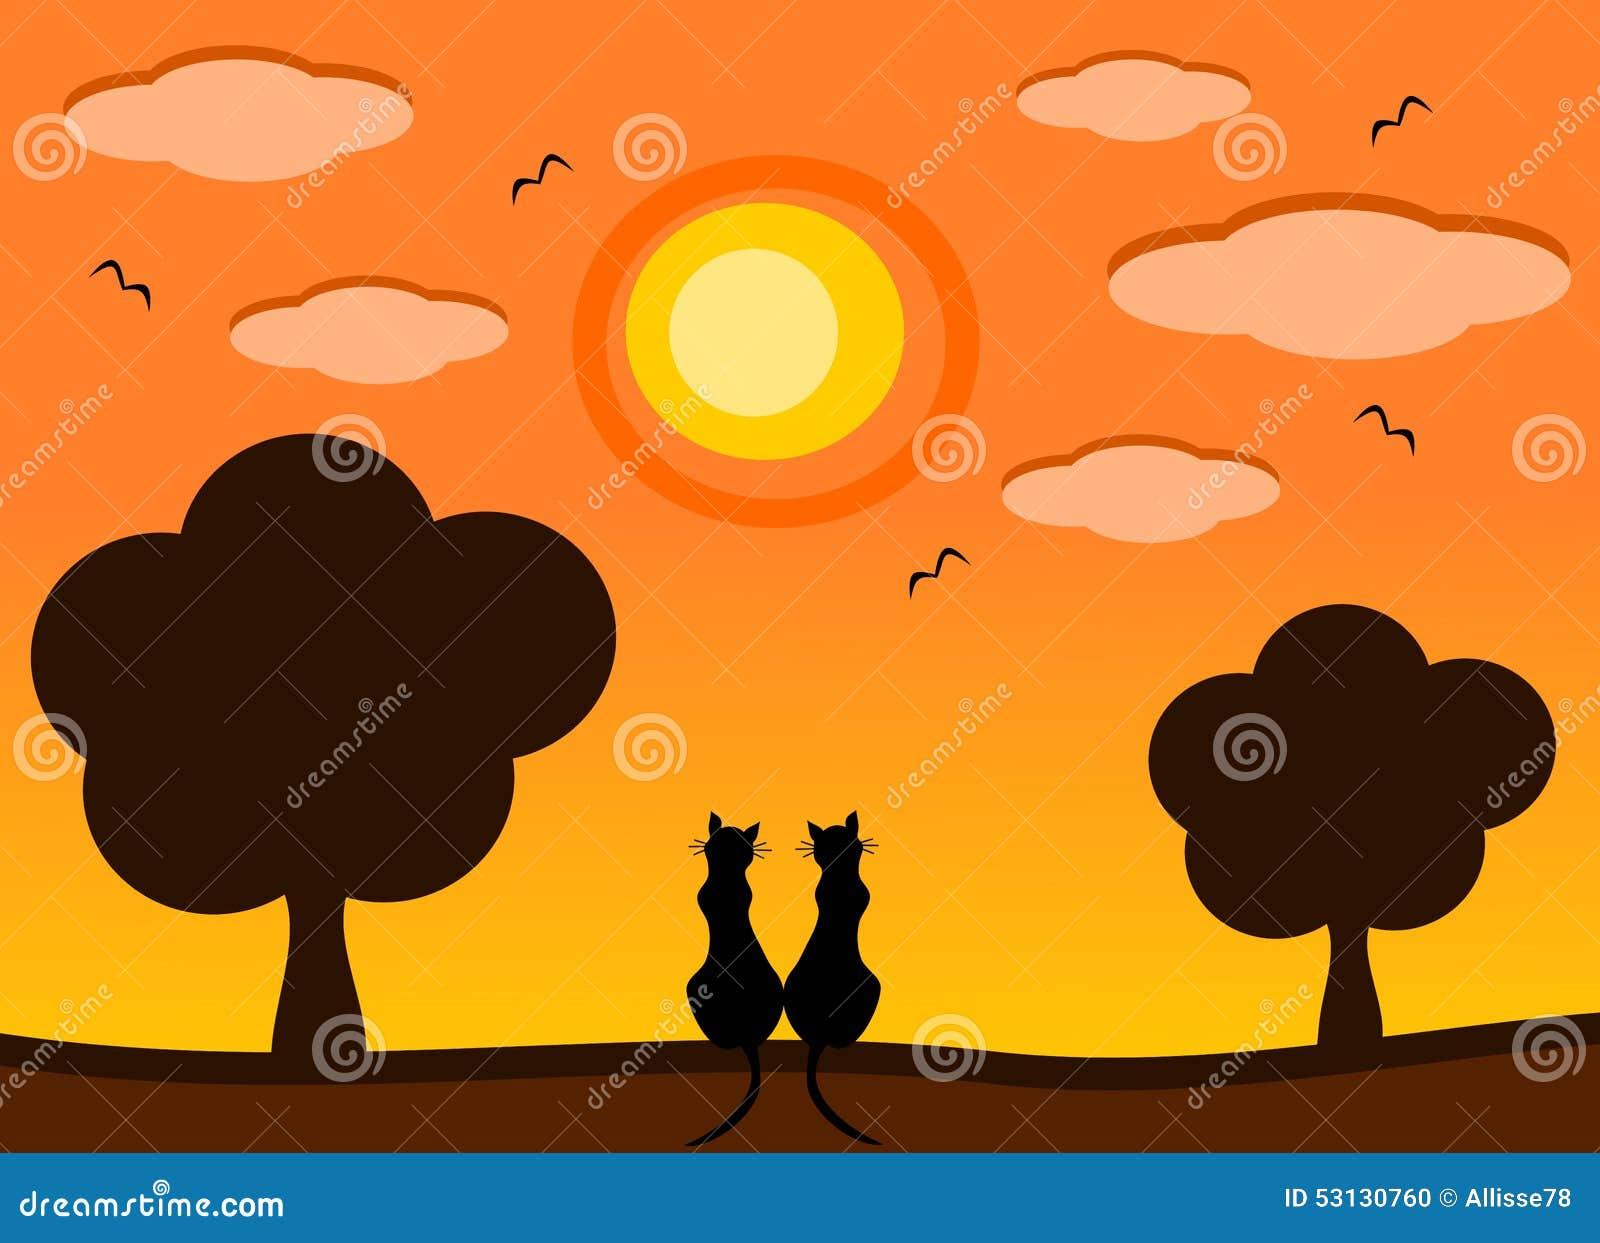 pin house cartoon sunset - photo #41